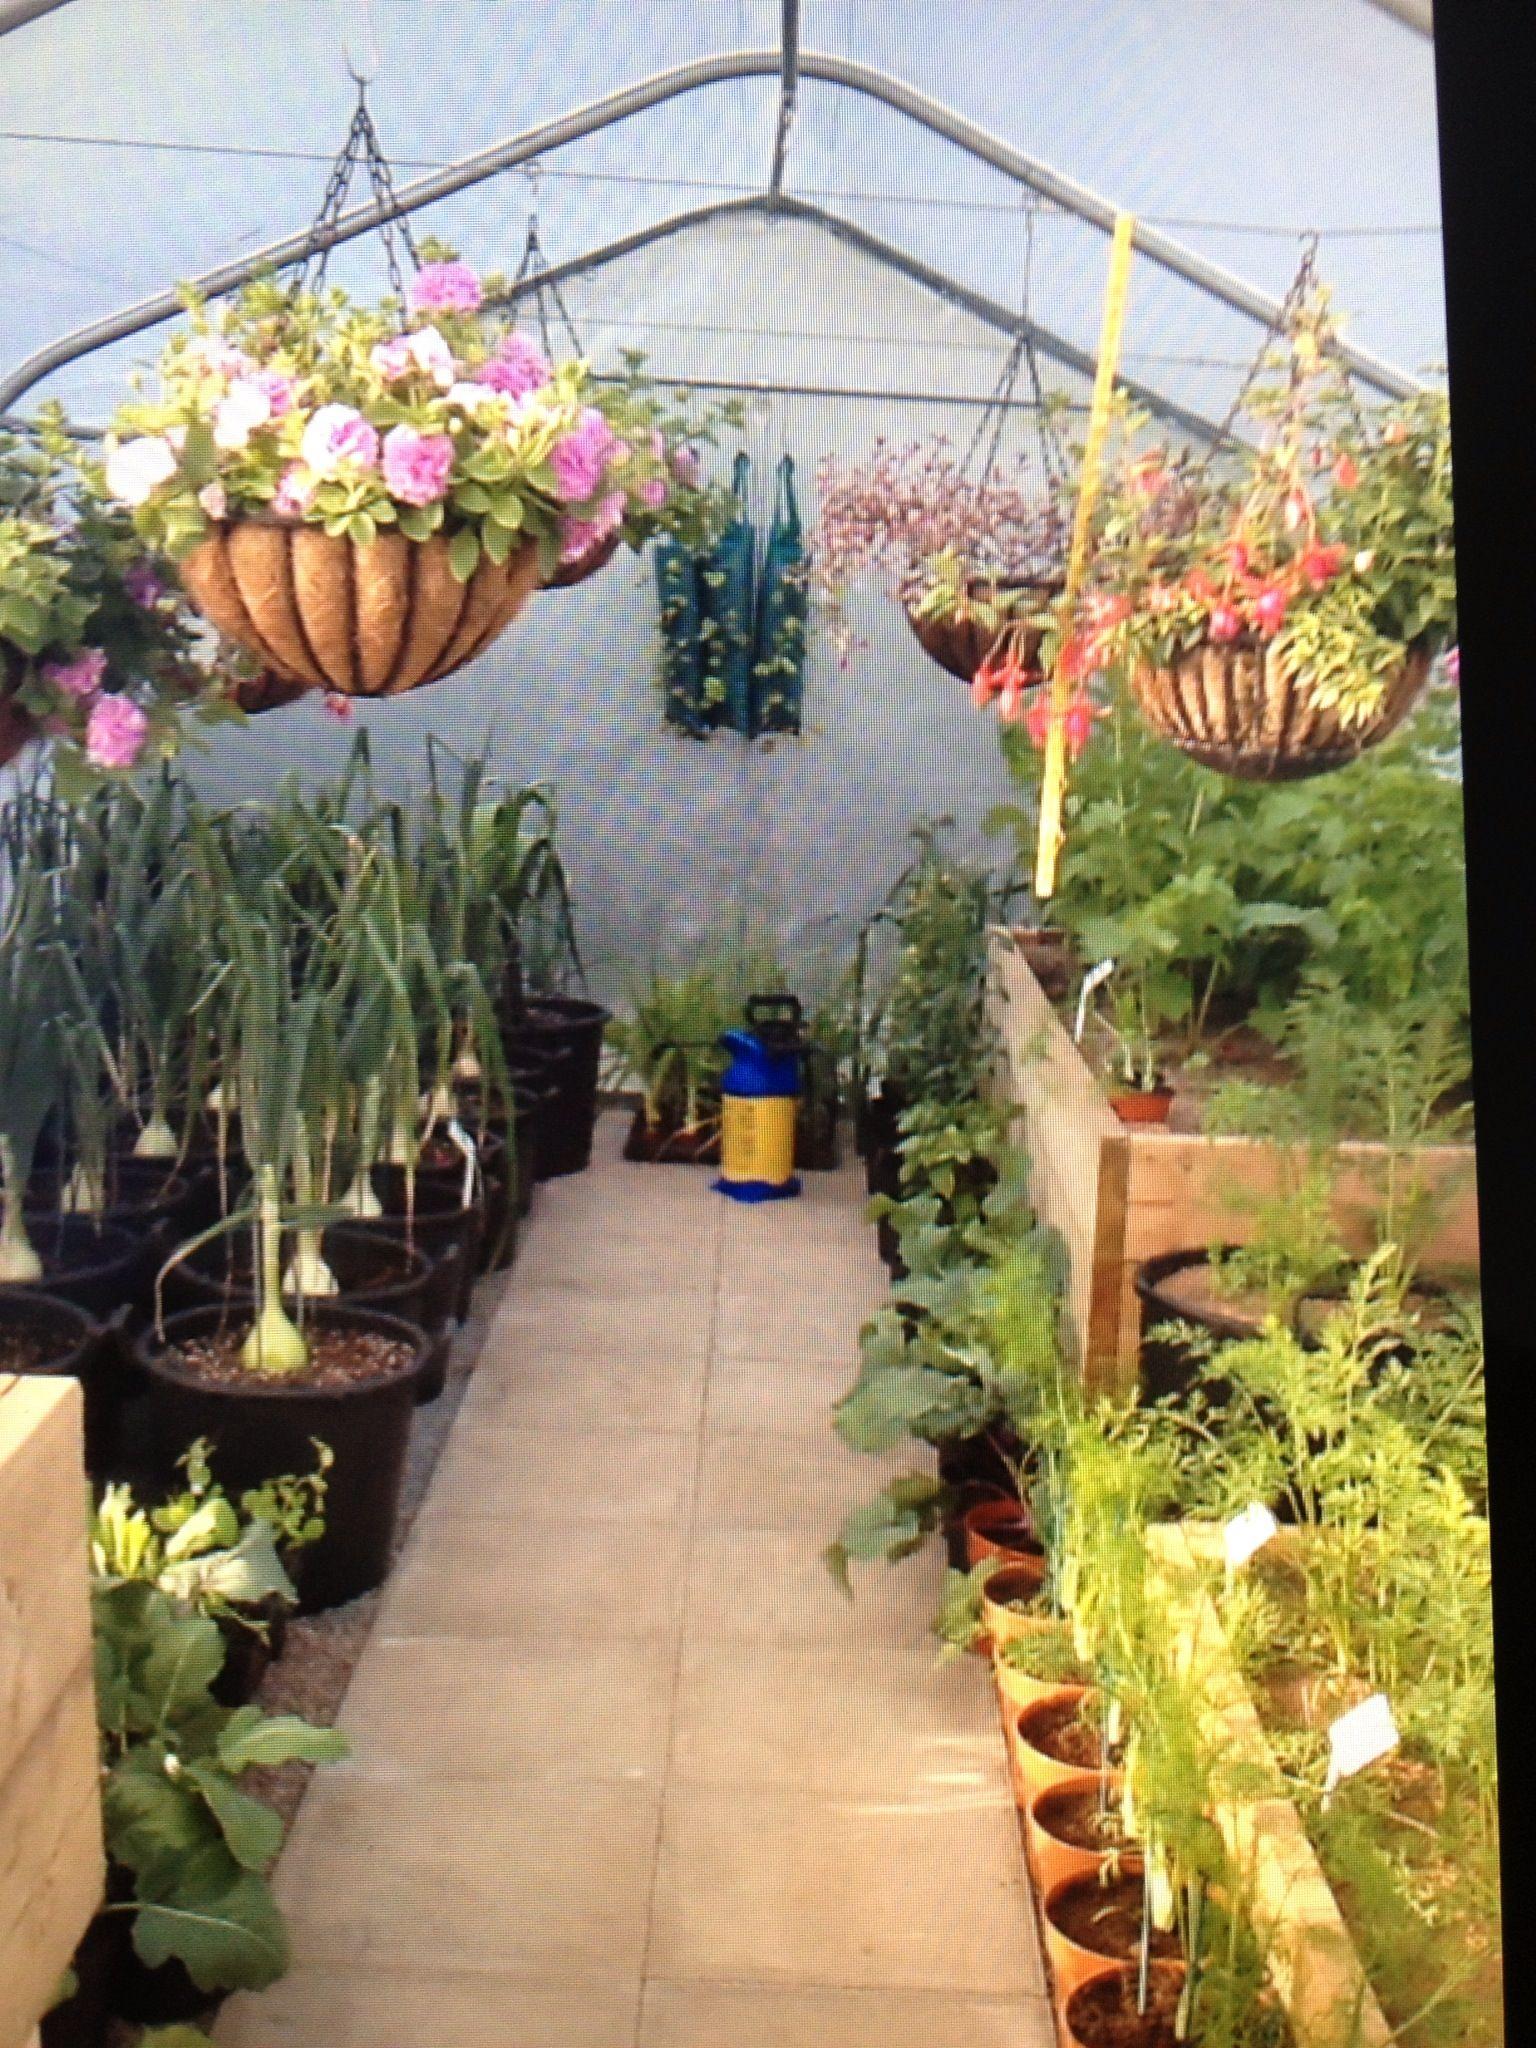 ross audio audiobooks beginners gardening listen nancy for orig extended audiobook greenhouse by instantly square sample garden